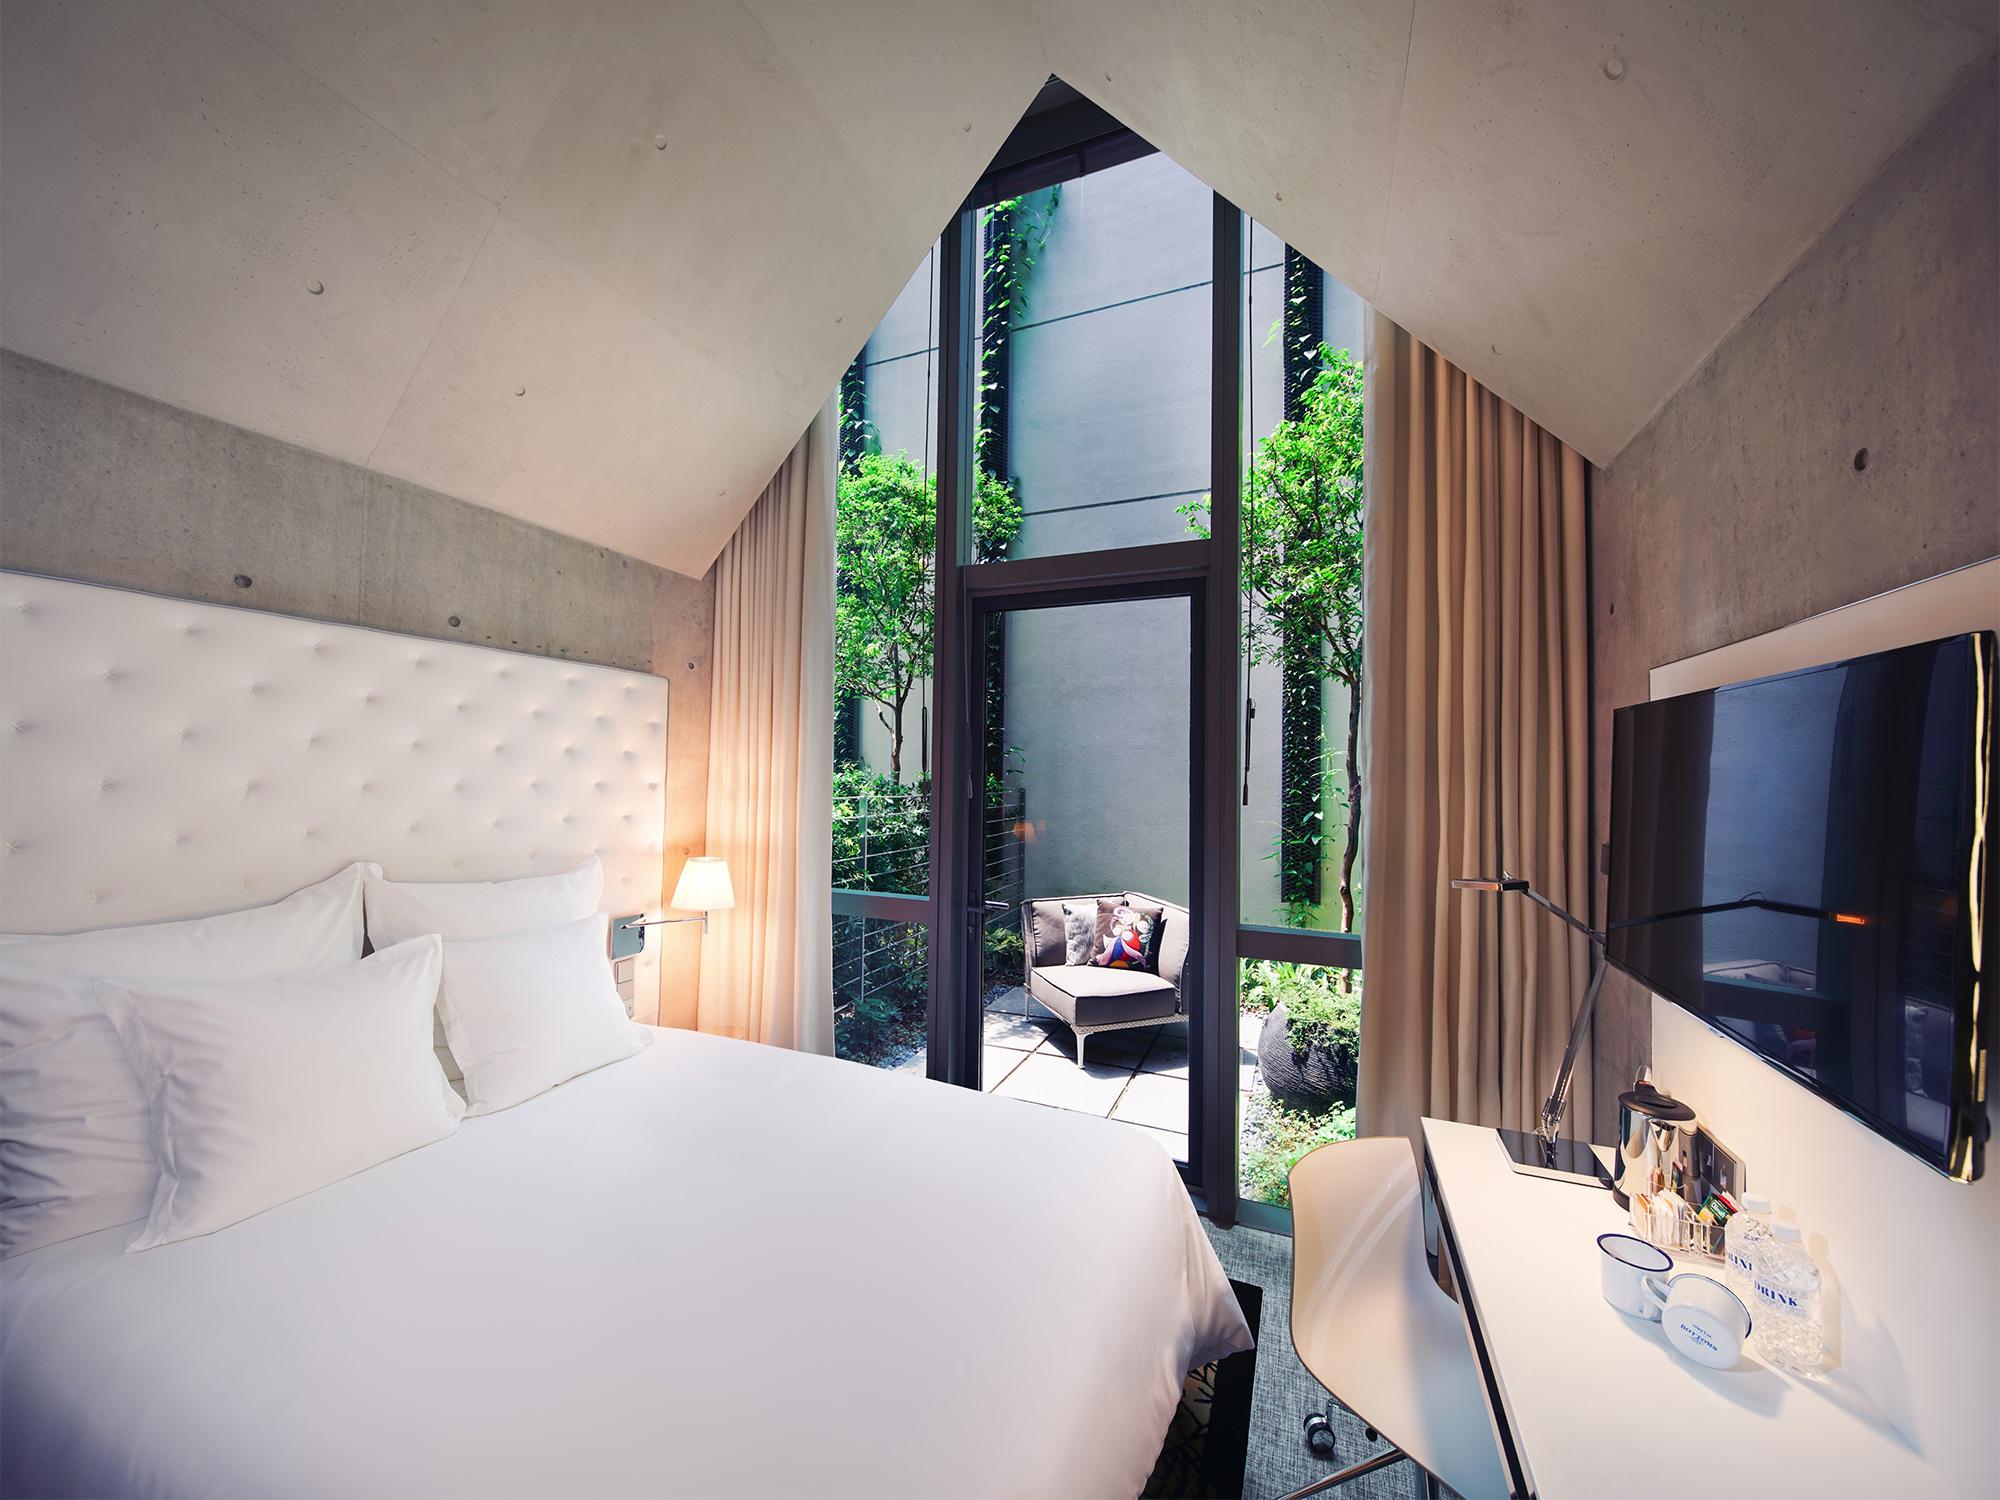 M Social Alcove Terrace Room (Millennium Hotels)